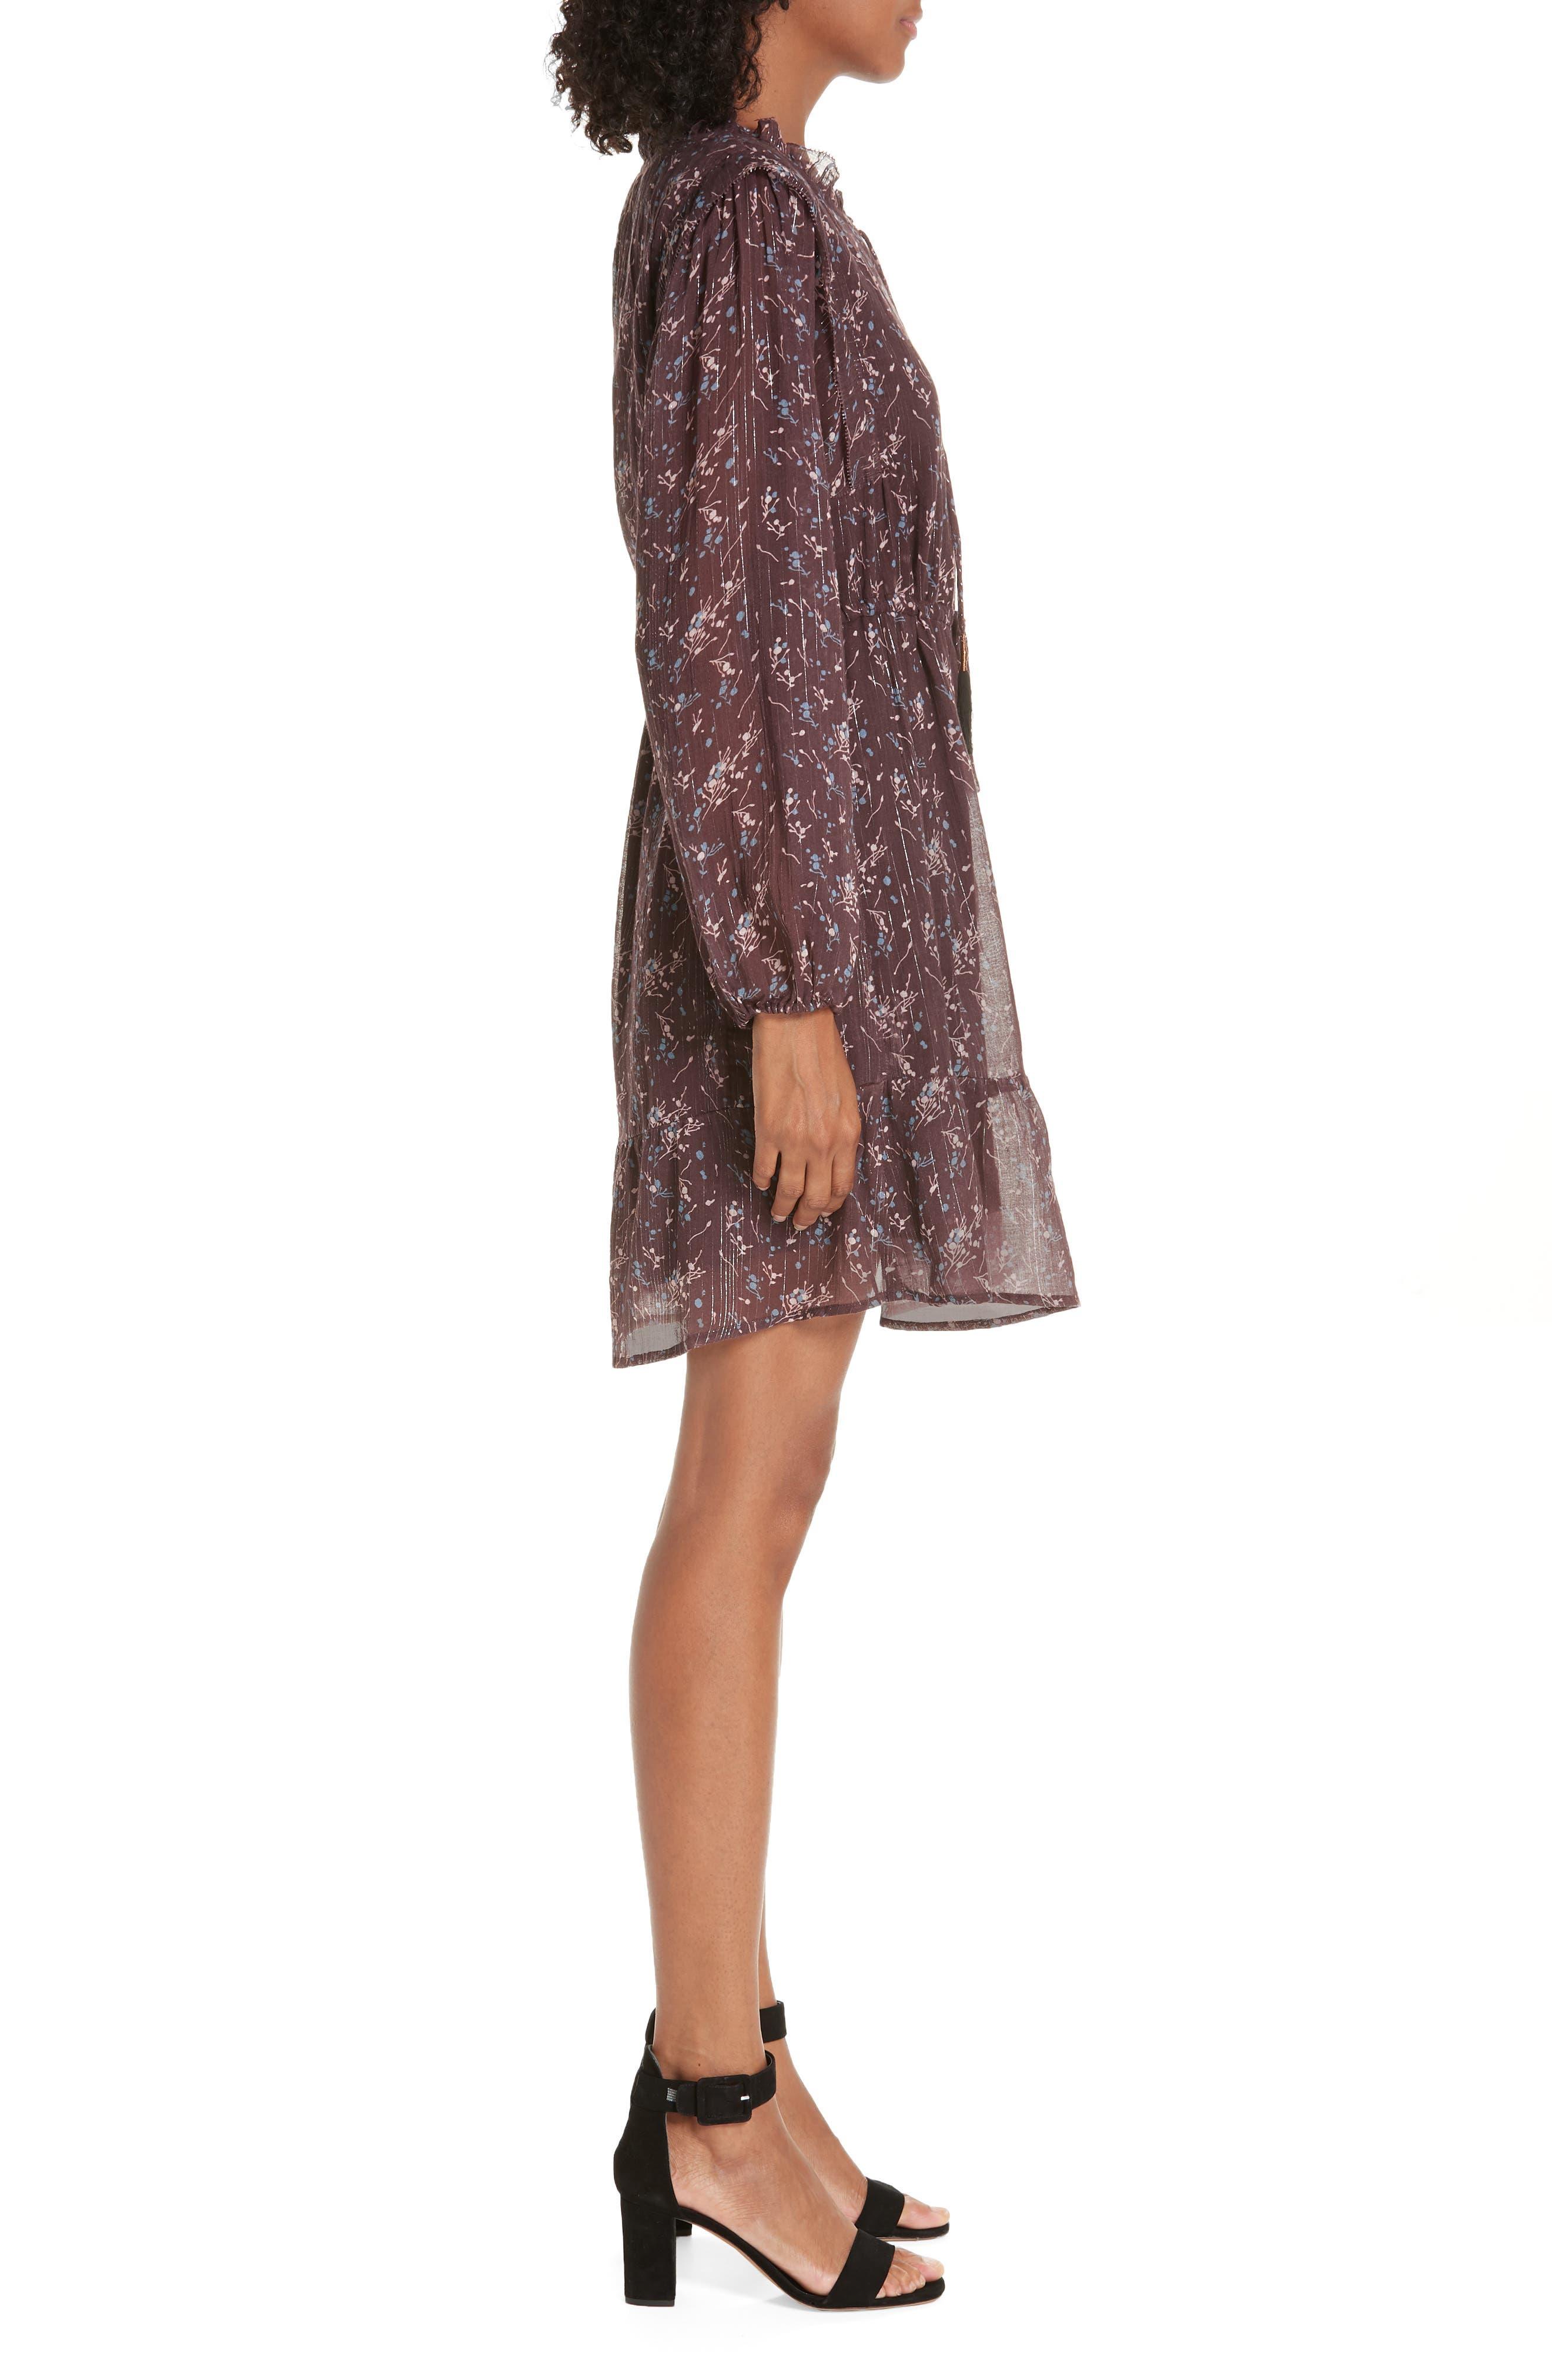 Ruffled Drawstring Waist Dress,                             Alternate thumbnail 3, color,                             BROWN PLUM BLOSSOM